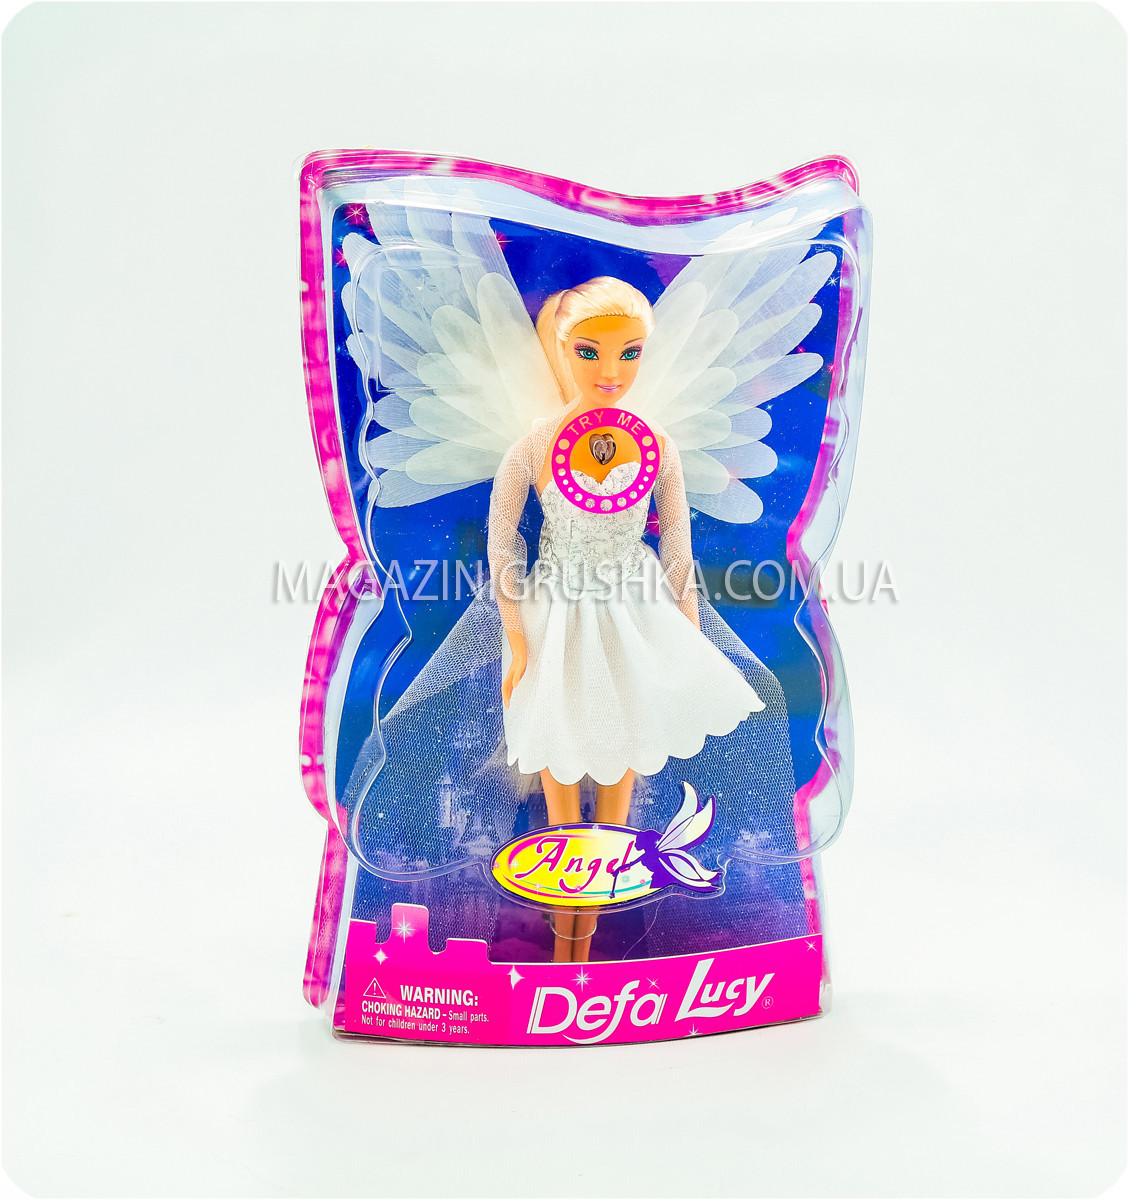 Кукла Defa Lucy «Ангел» (световые эффекты) 8219